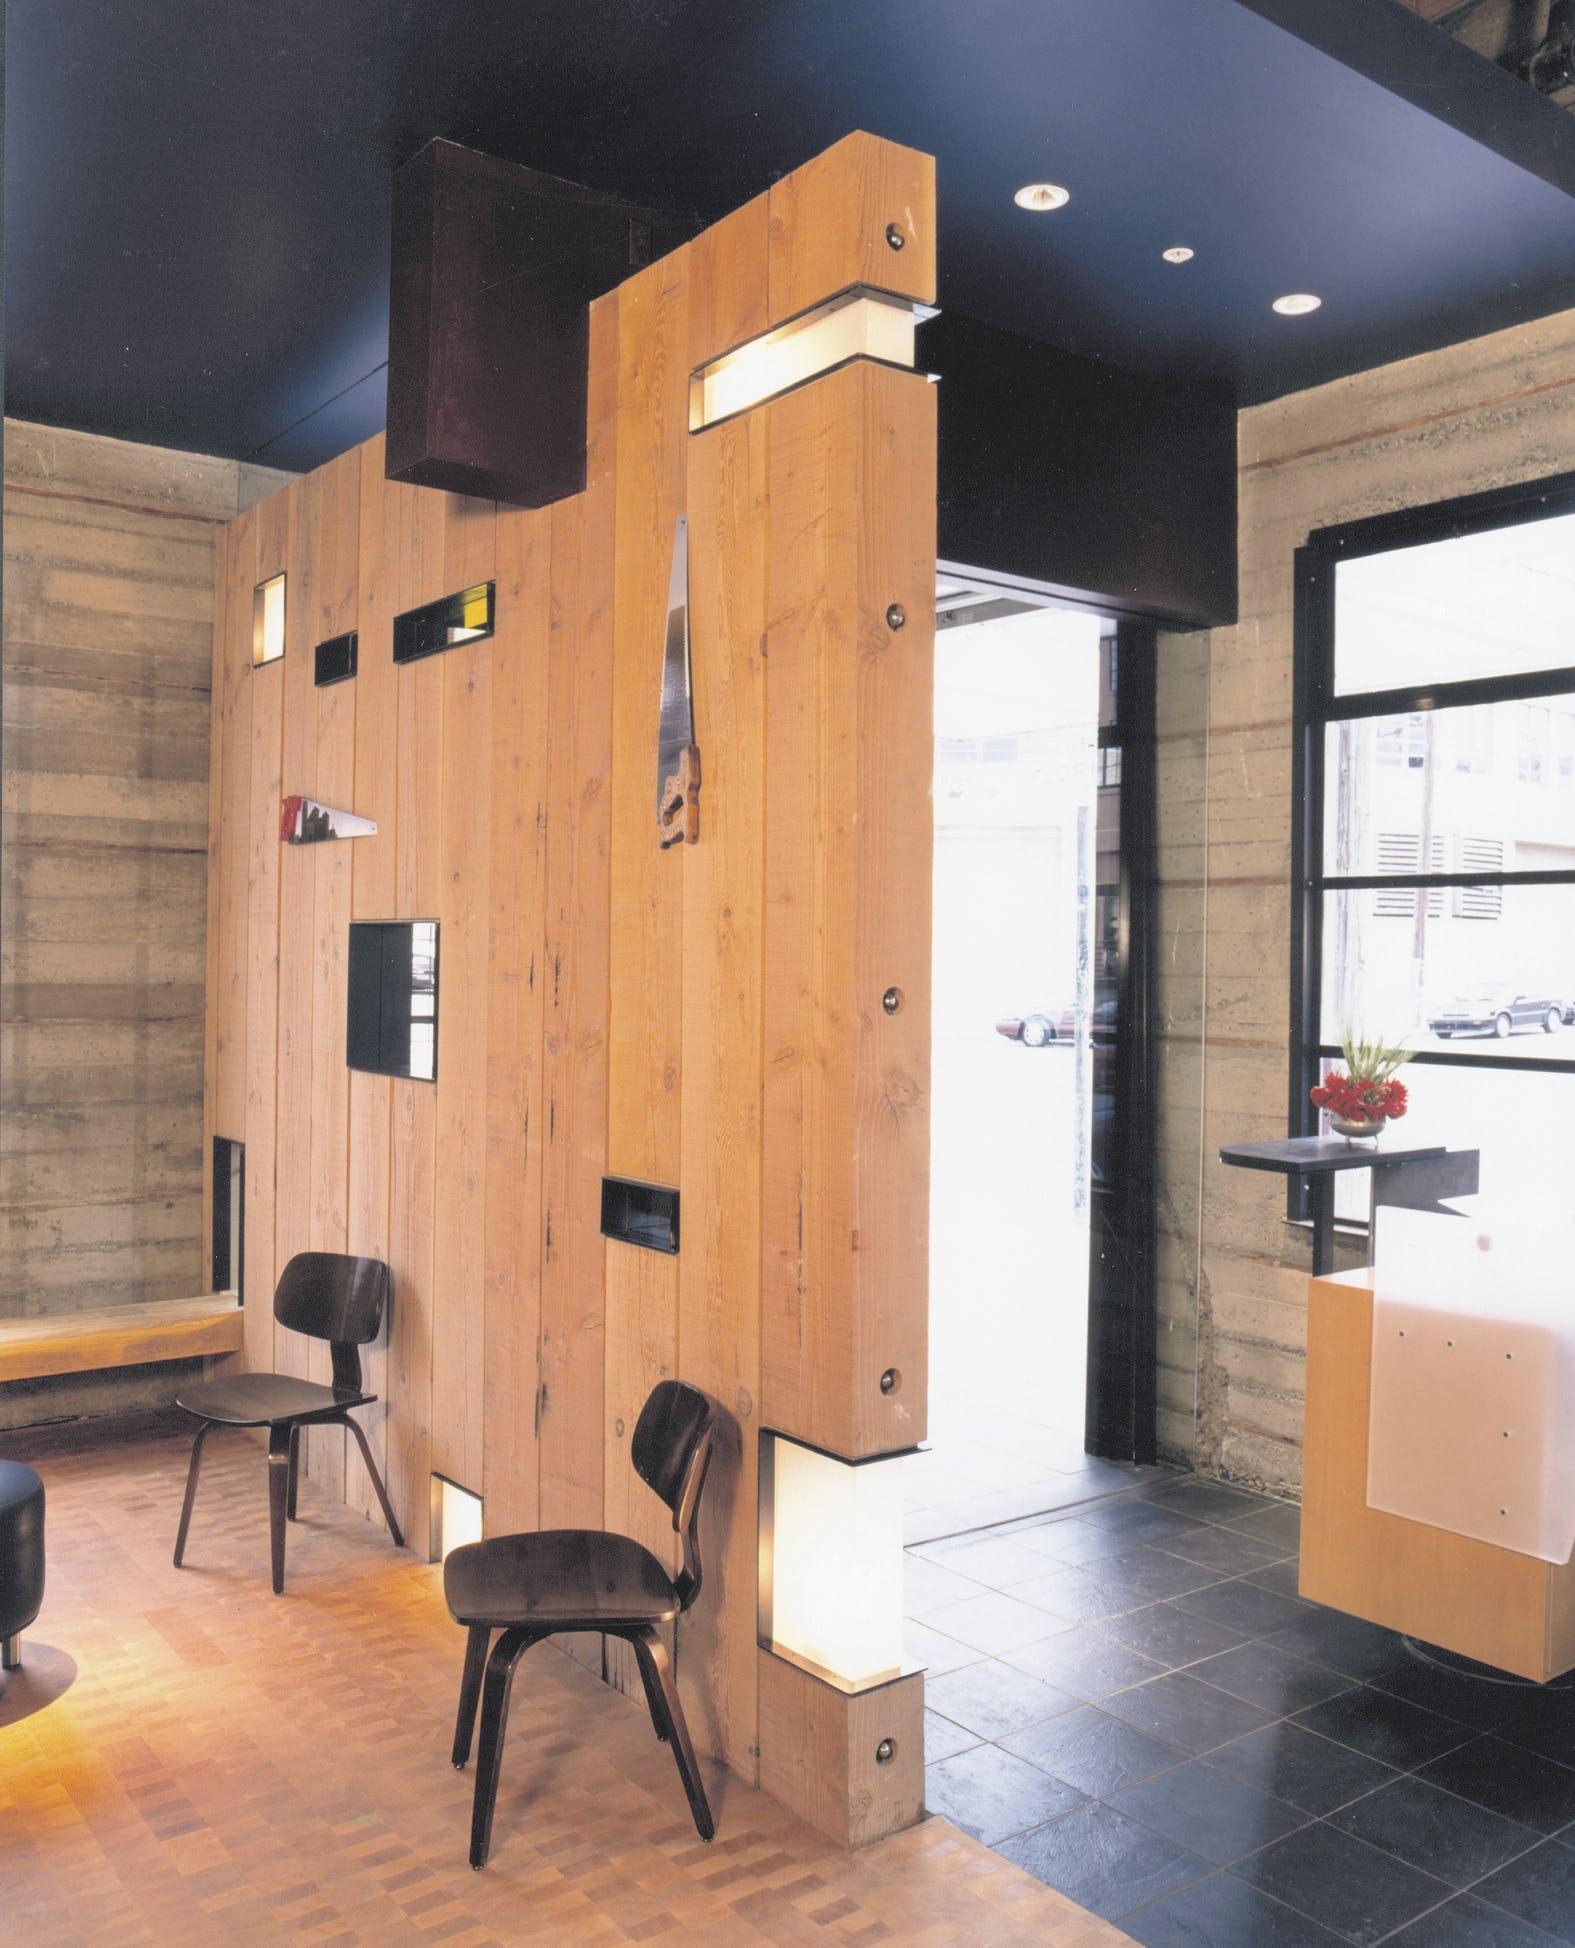 Builtform construction gordons wood chairs windows modern smaller copy